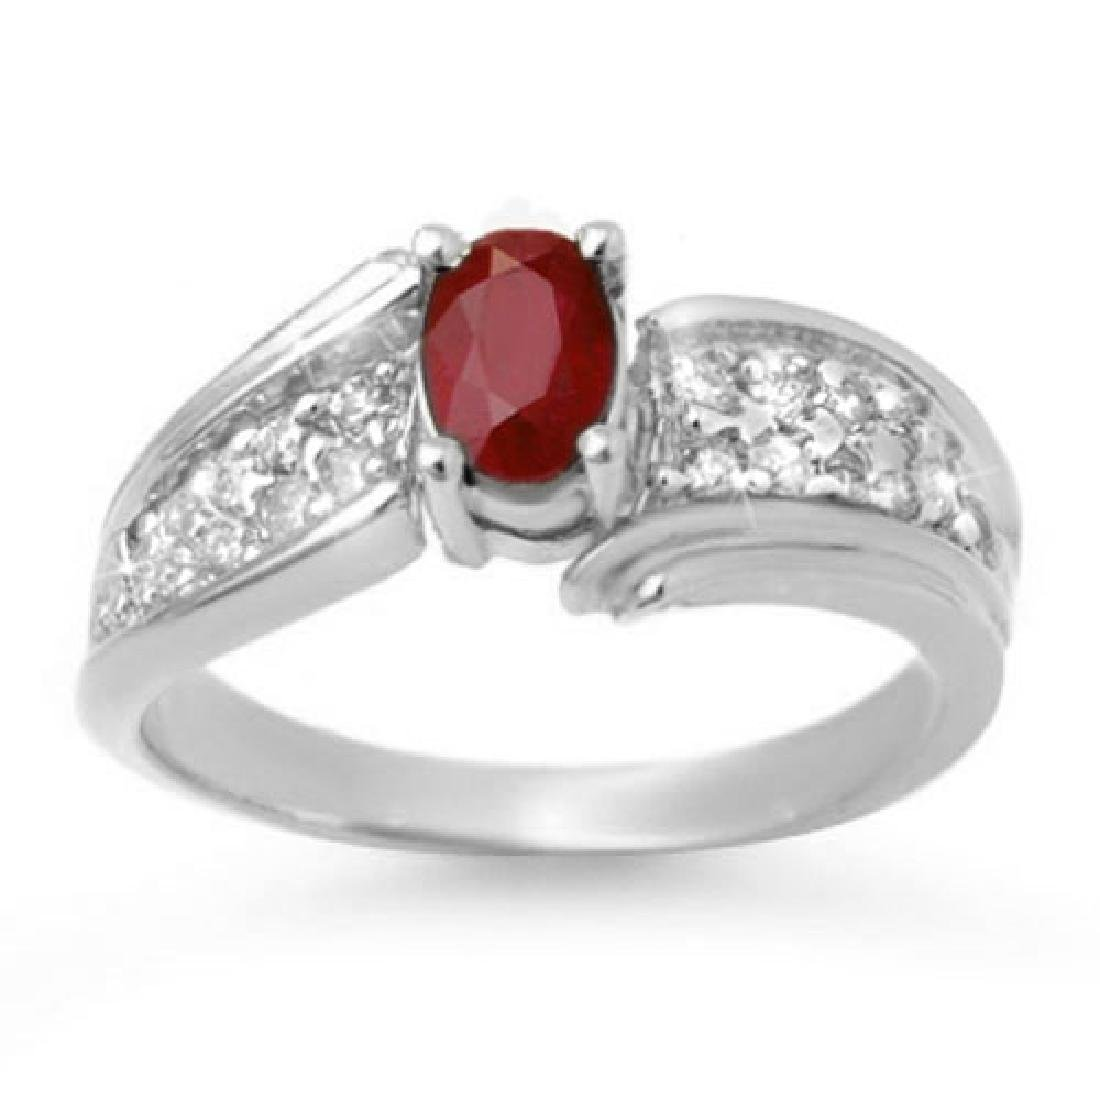 1.43 CTW Ruby & Diamond Ring 14K White Gold